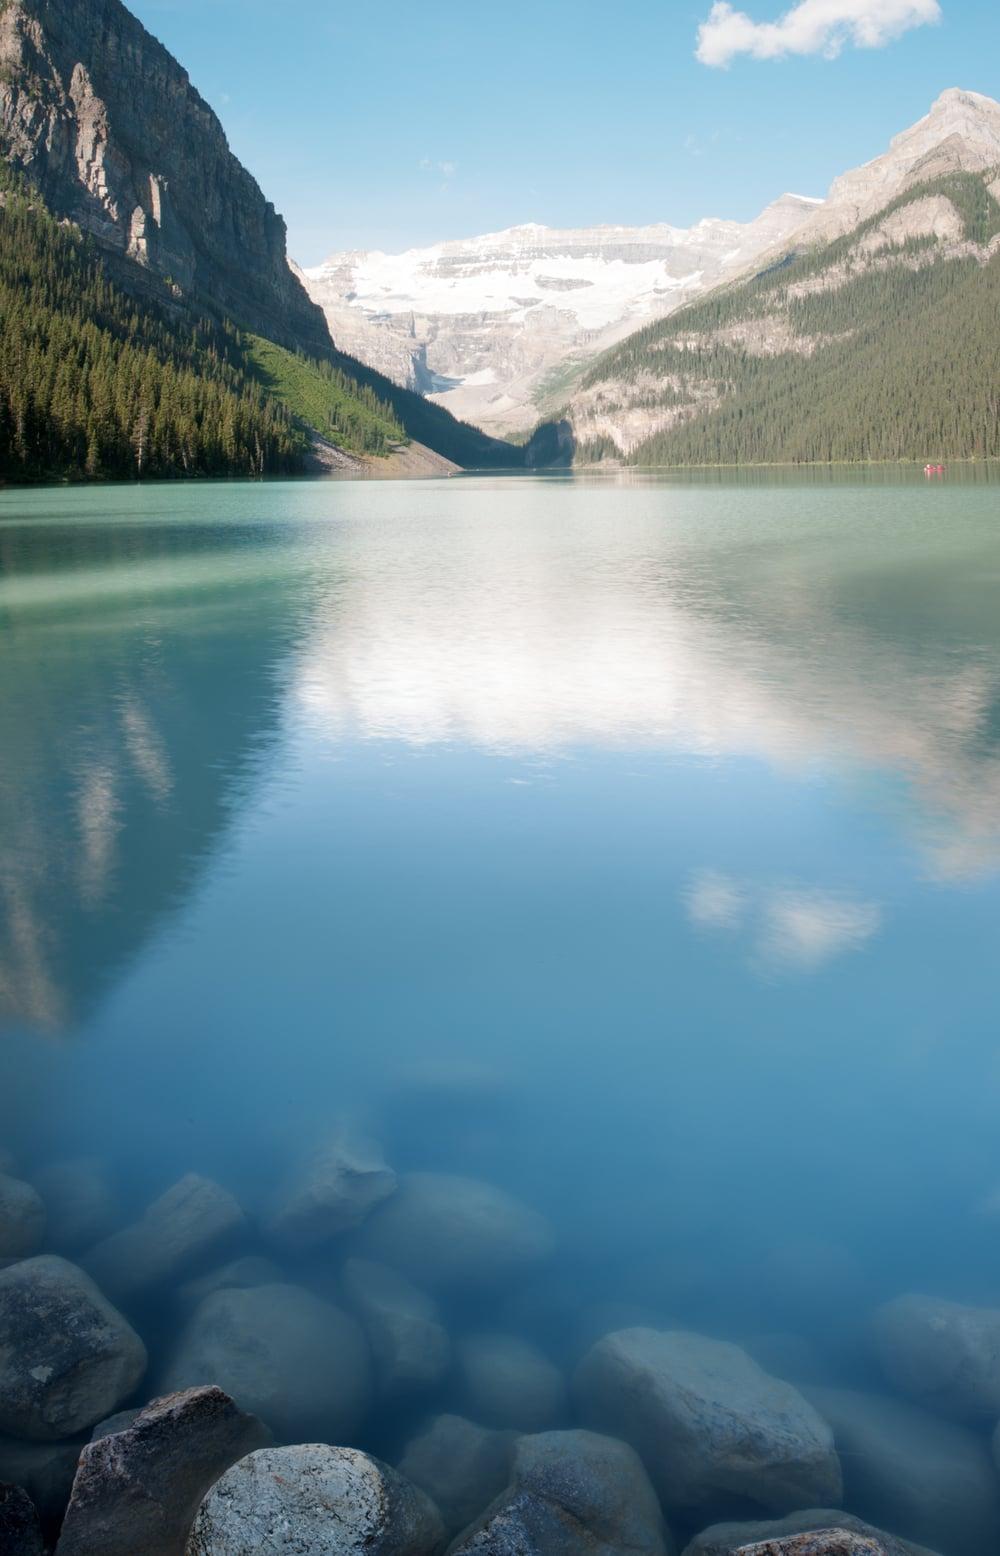 Lake Louise, Banff National Park, July 2015